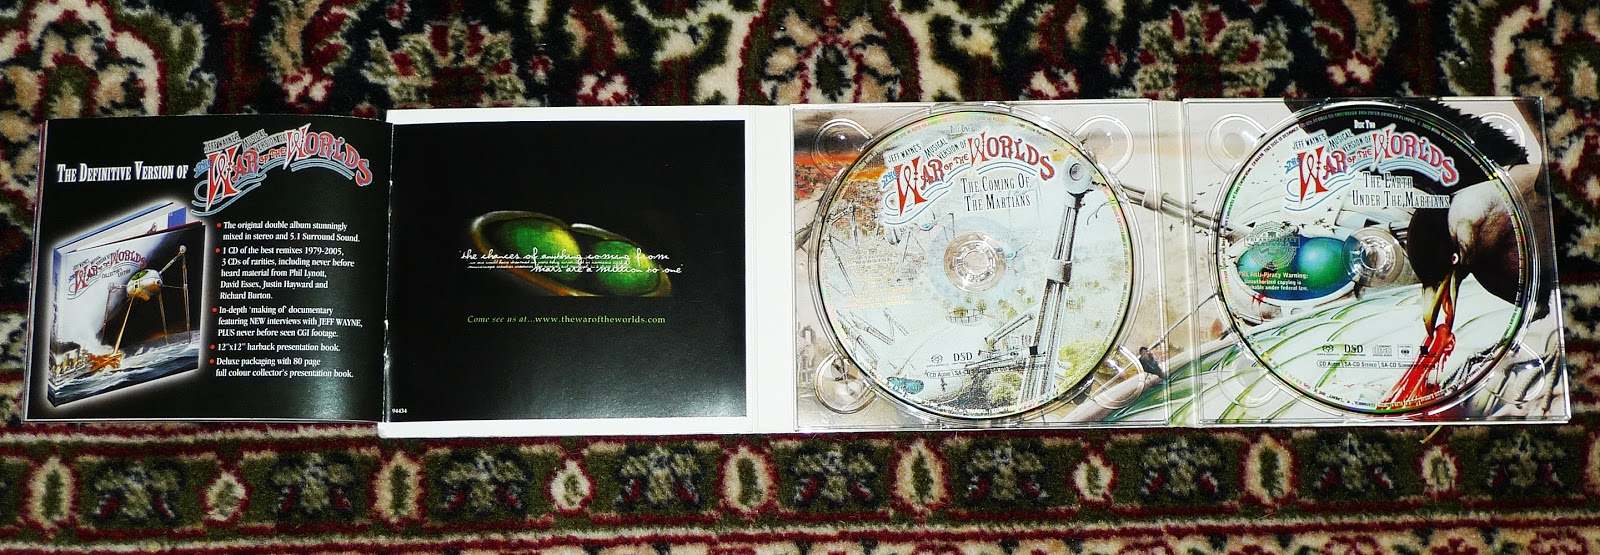 Alternate Discs Digital Sound Even Better? SACD DVD-Audio